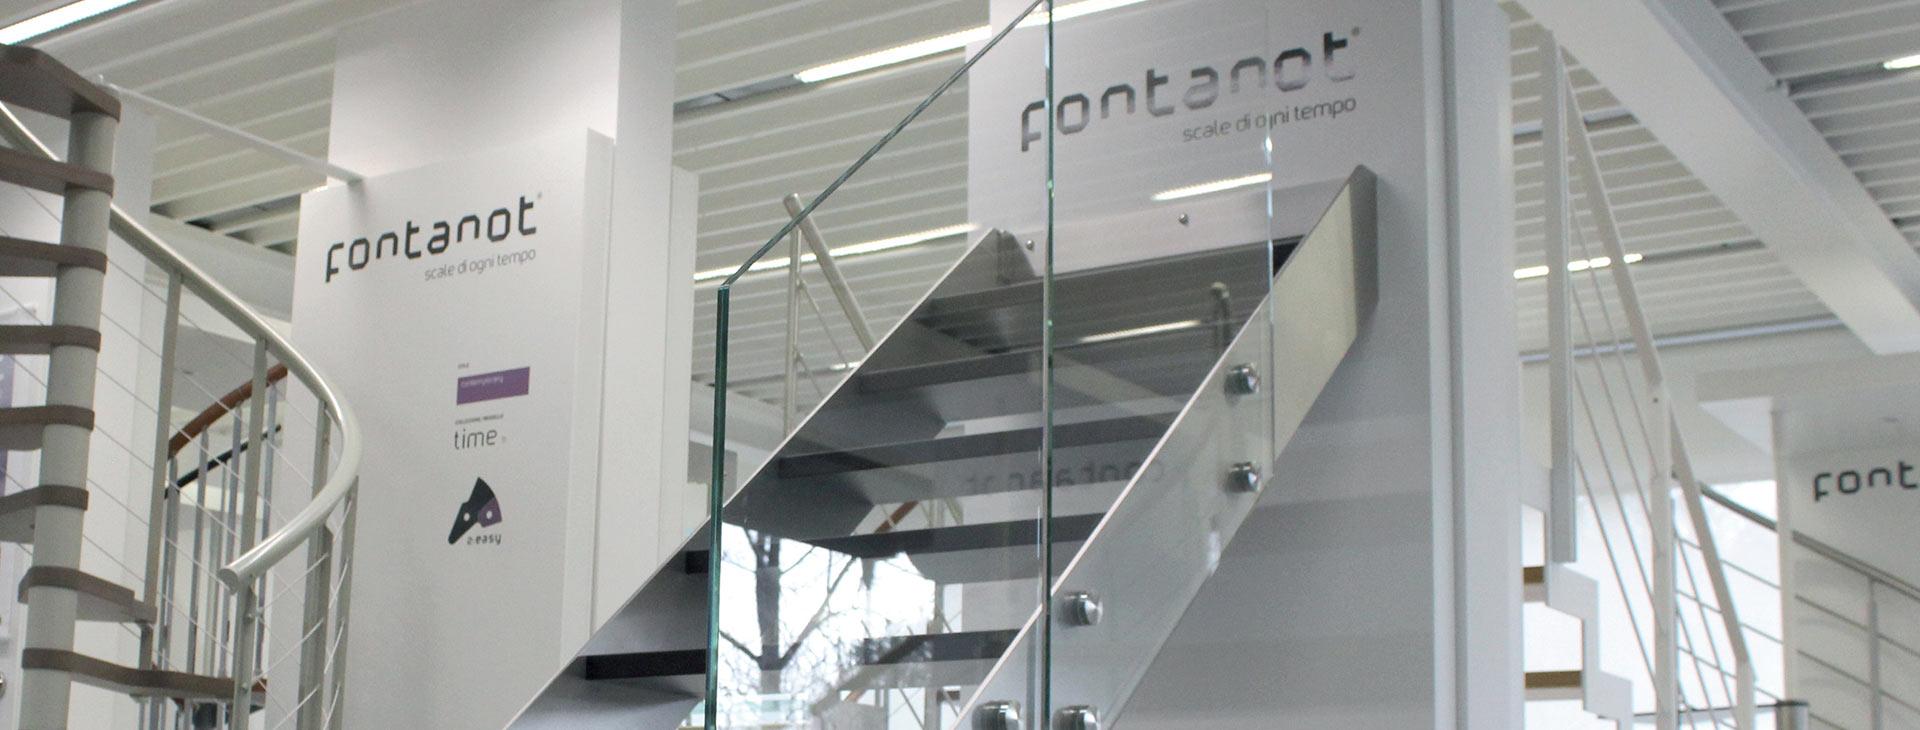 rivenditori scale Fontanot